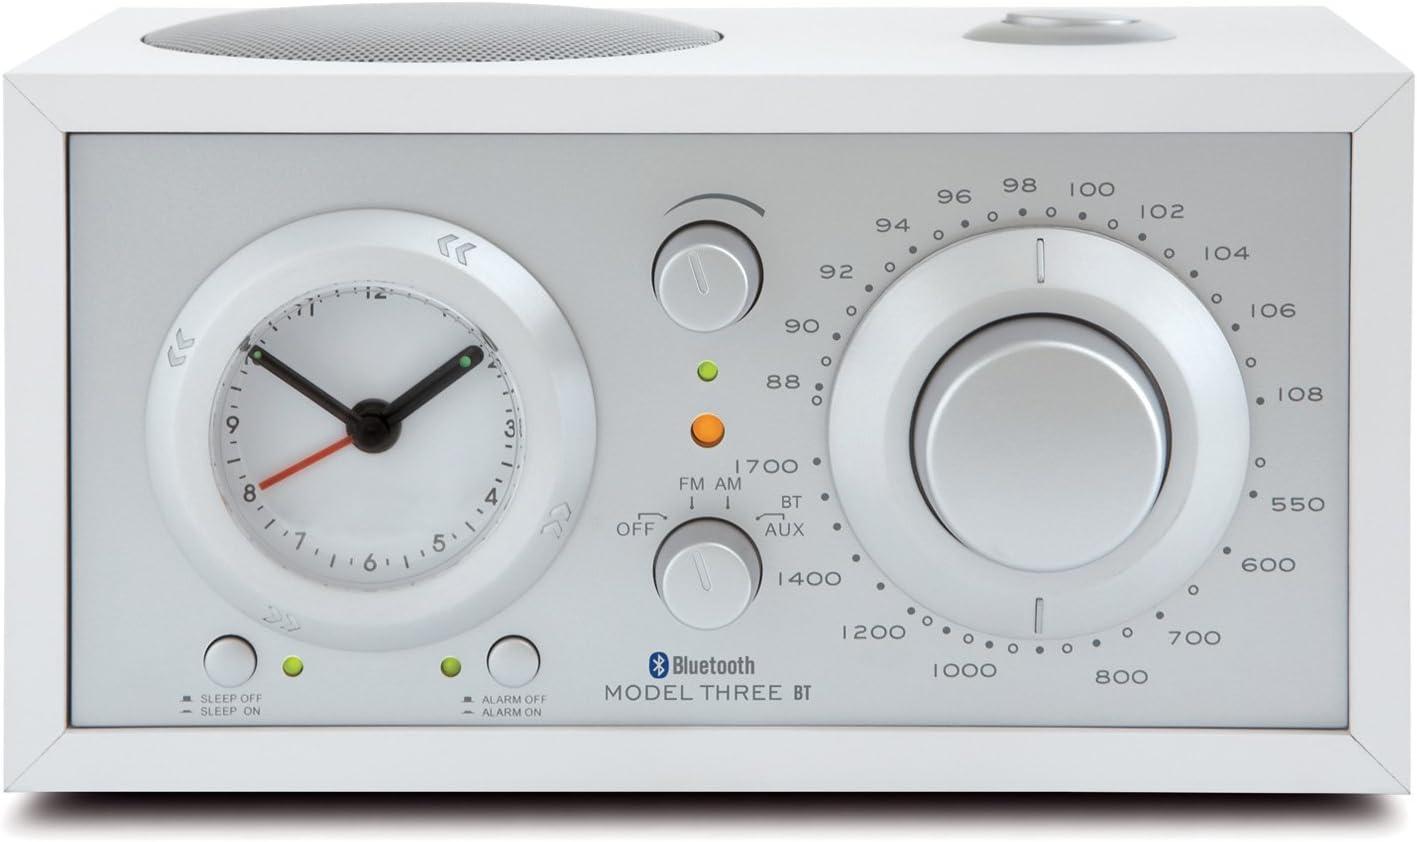 Tivoli Audio Three Bluetooth Ukw Mw Radiowecker In Weiß Silber Audio Hifi